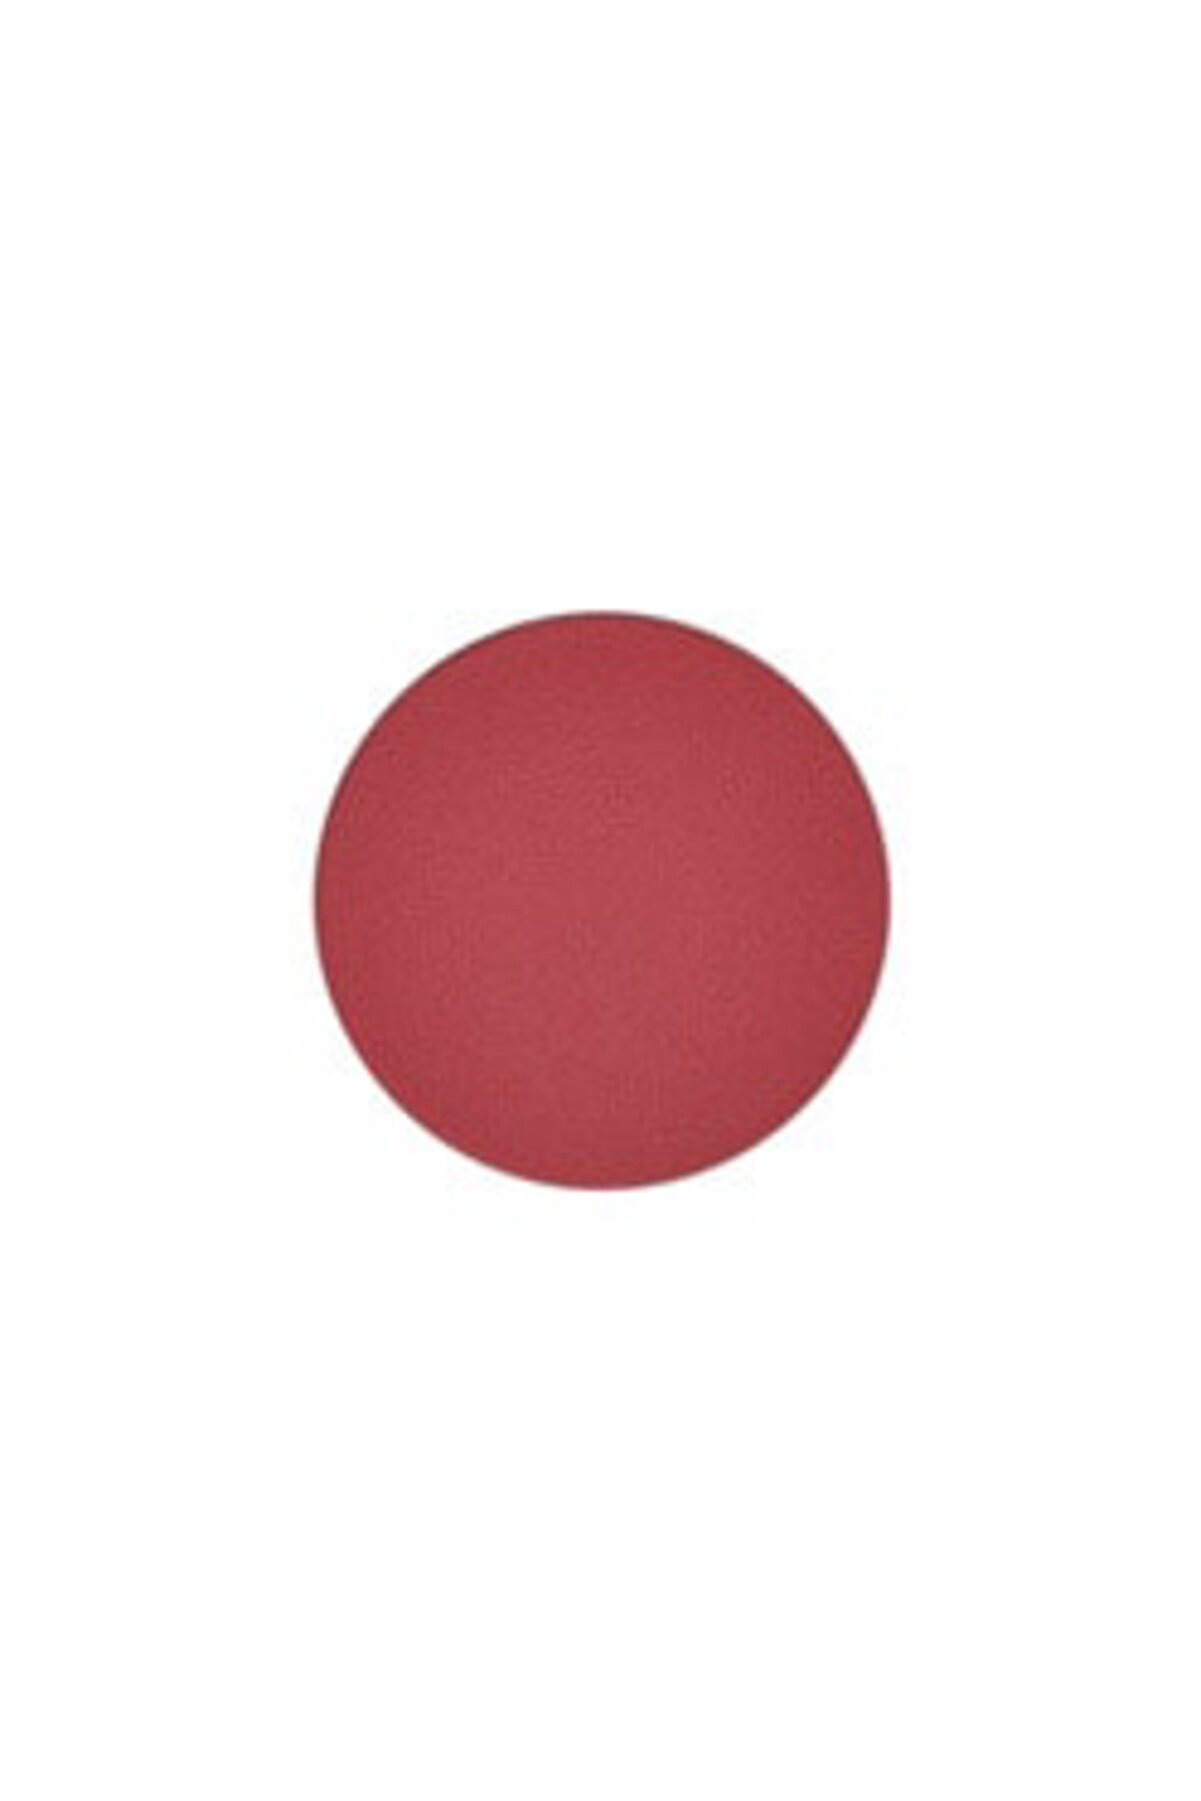 Mac Göz Farı - Refill Far Haute Sauce 773602572809